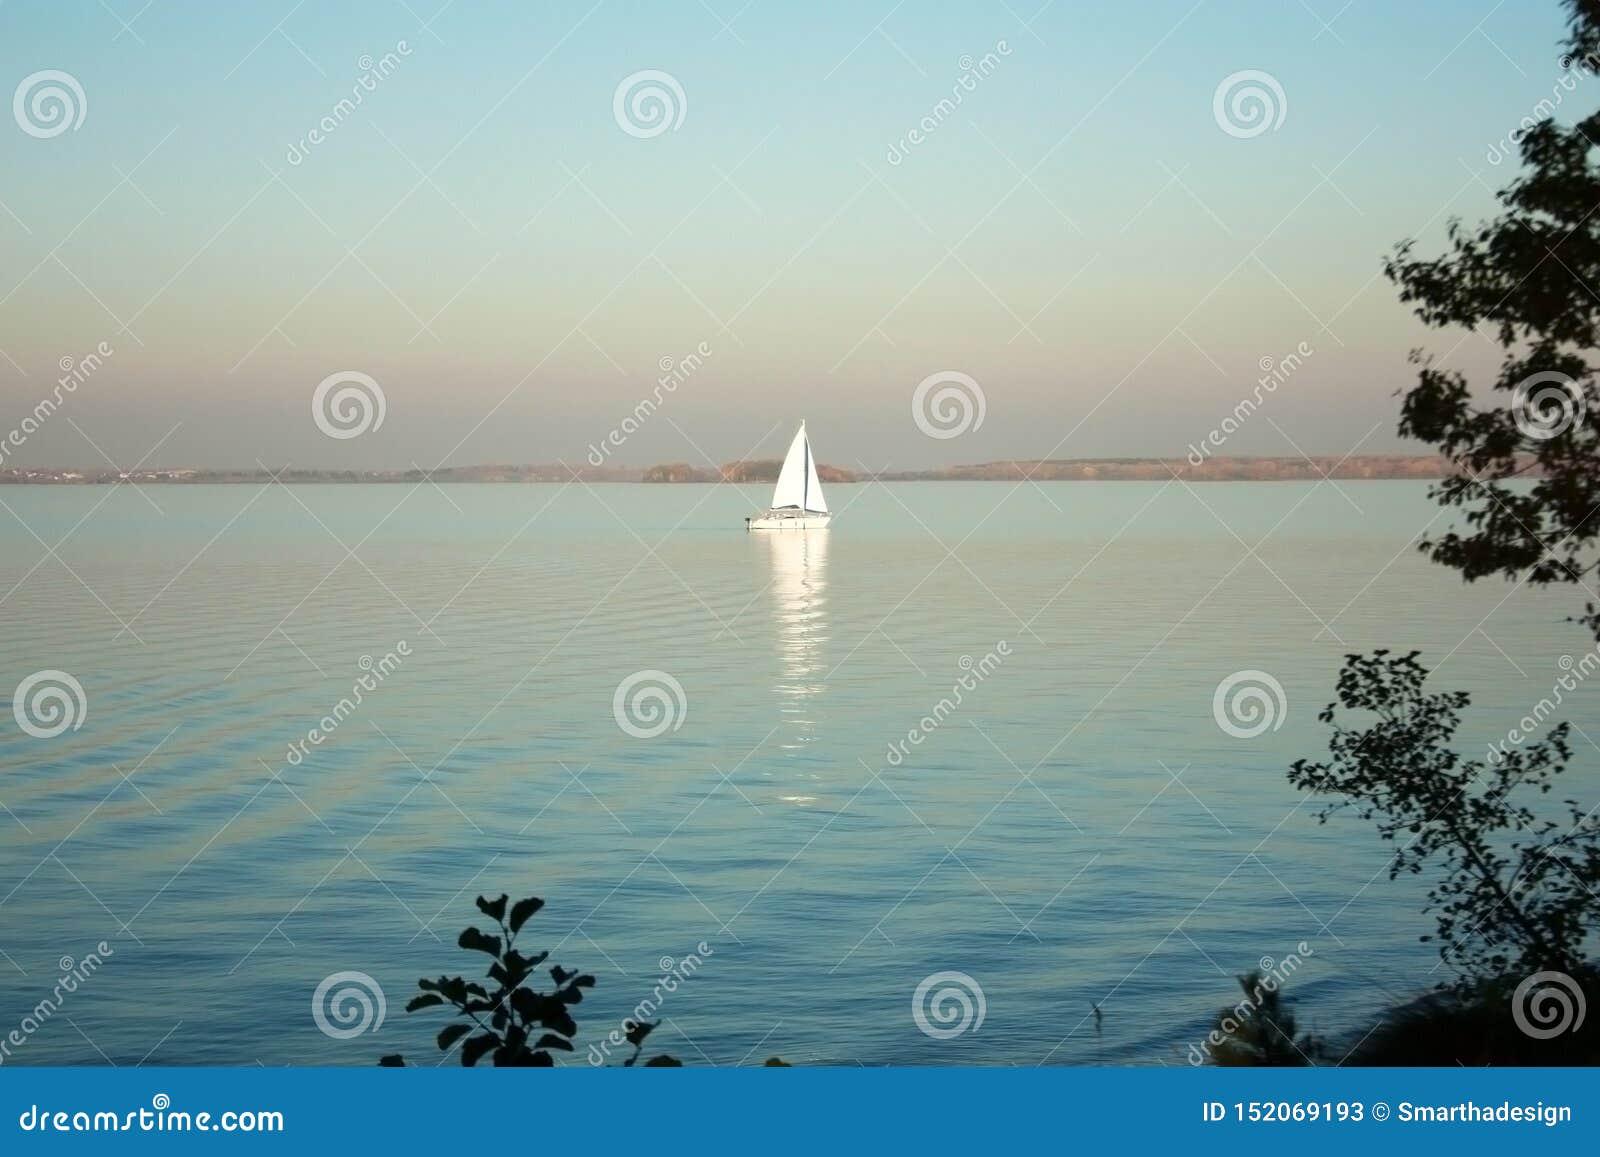 Beautiful lake landscape, yacht, and sunset. Blue waves, boat and horizon line on water. Beautiful background